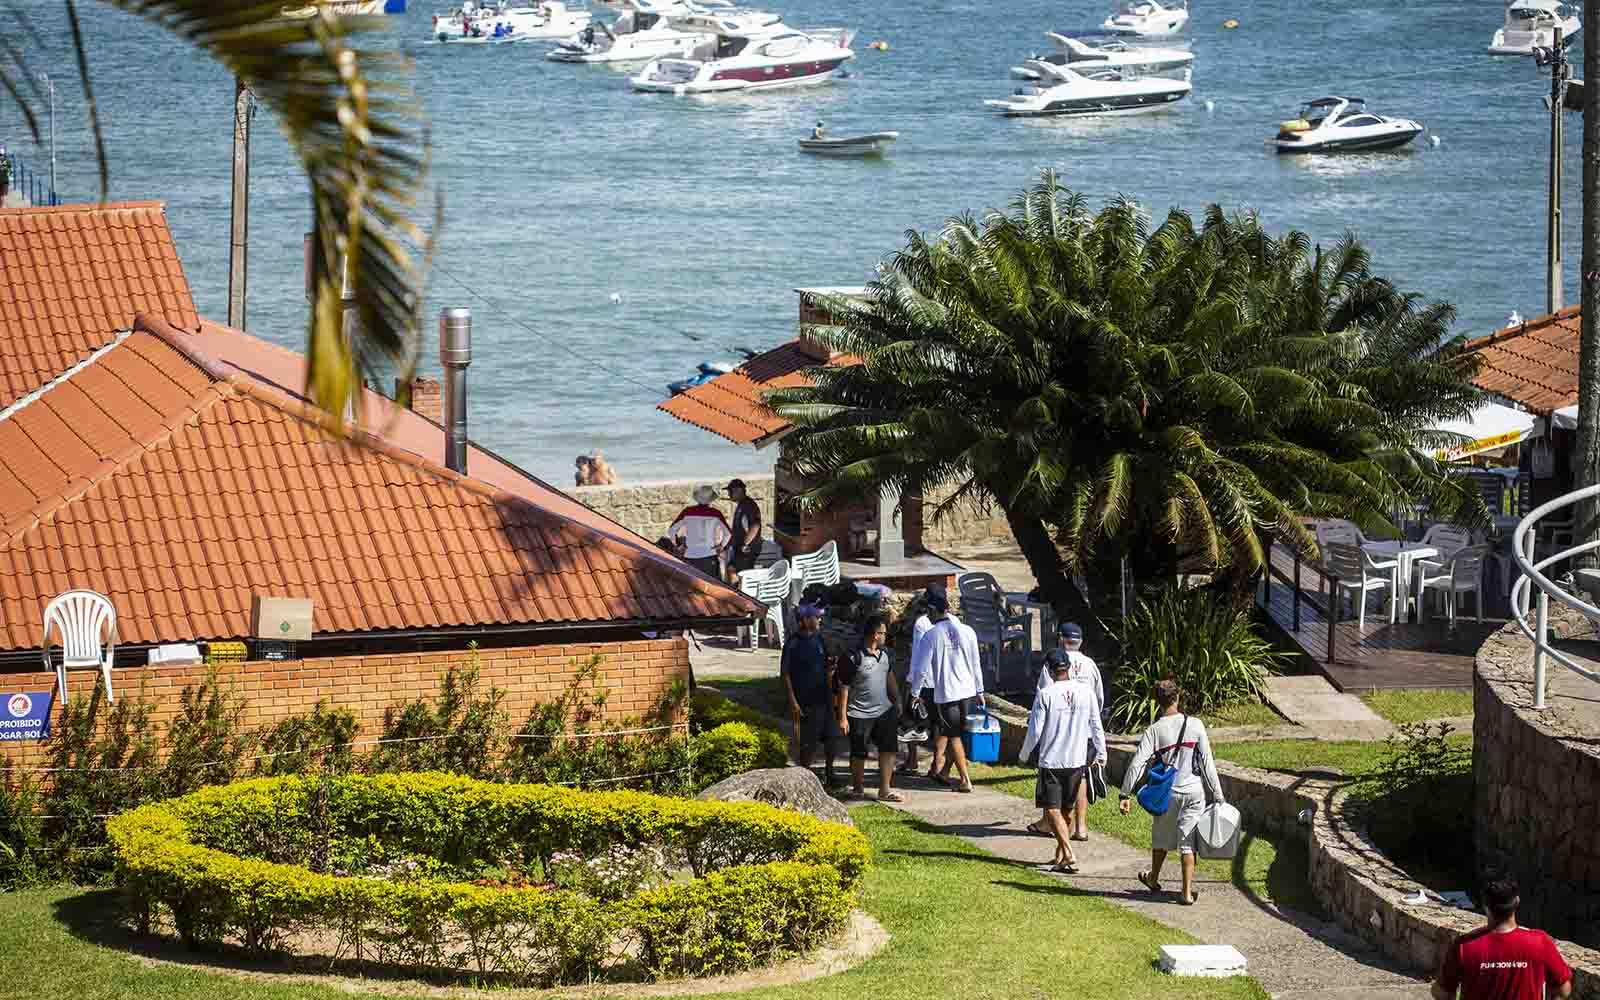 Circuito oceanico da ilha de santa catarina Fotos- Green Multimídia Iate Clube de Santa Catarina - boat shopping 2